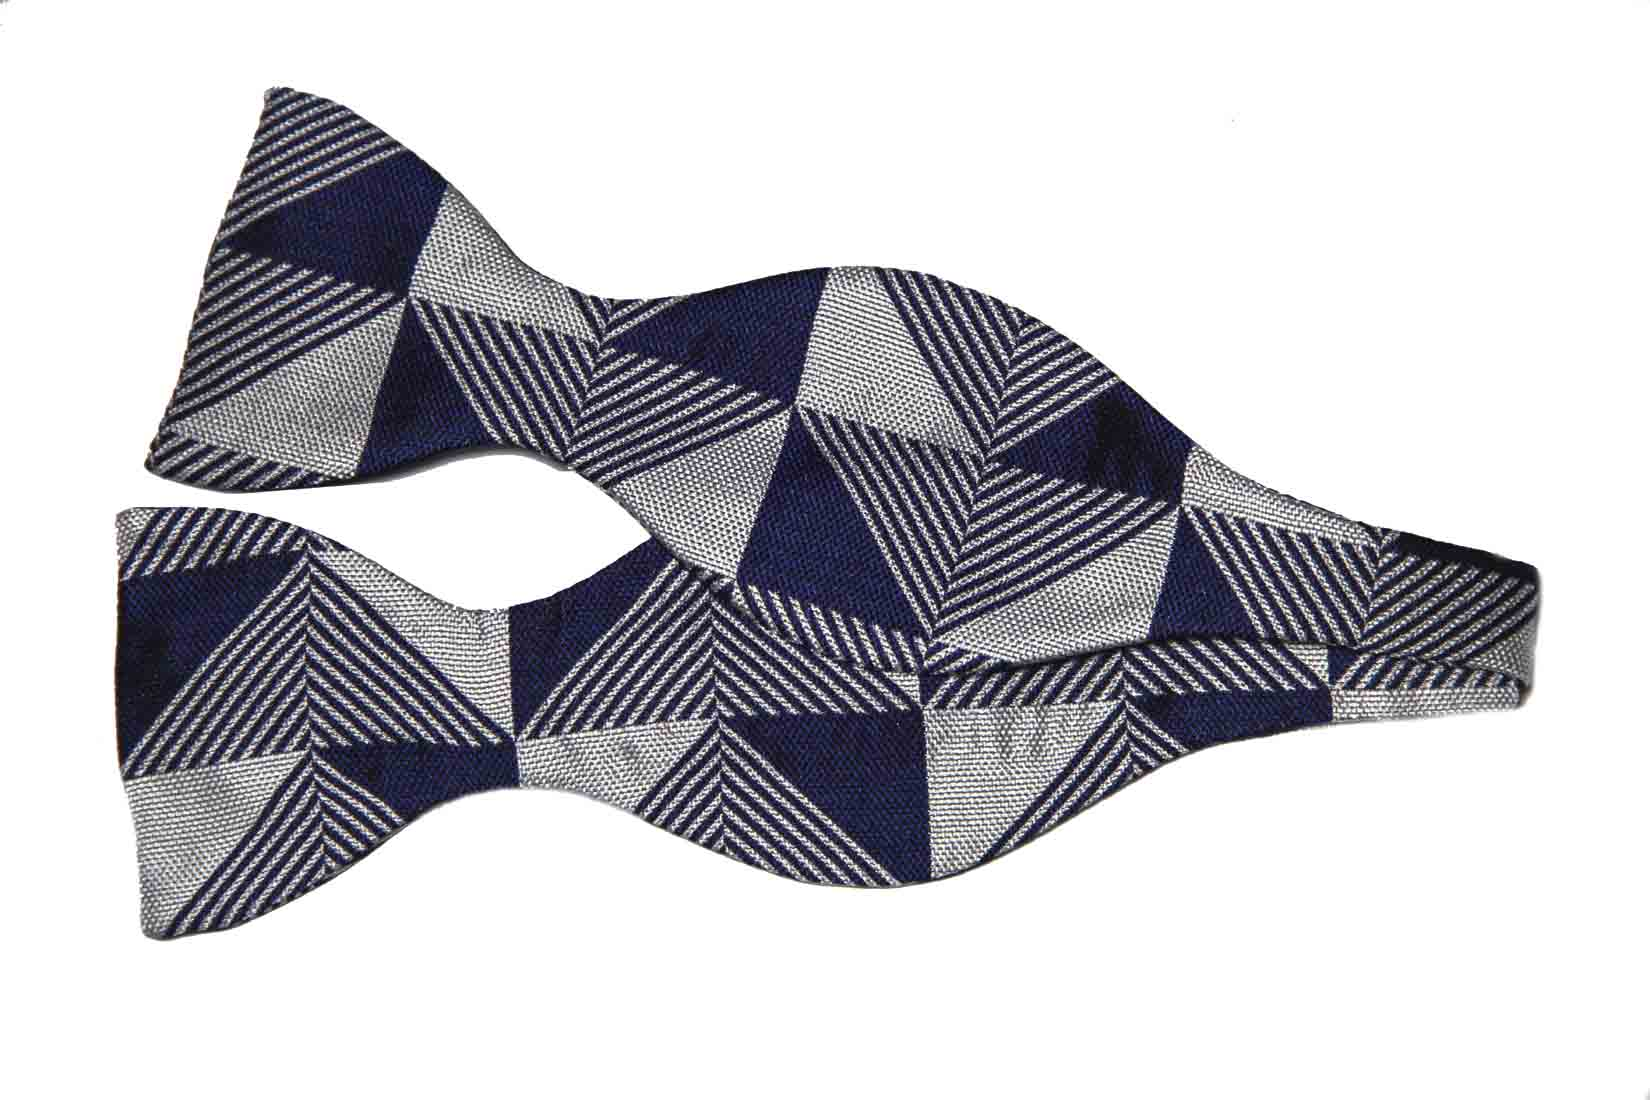 Thomas Pink Bow Tie Knighton Geo Navy Blue Gray Silk Men's